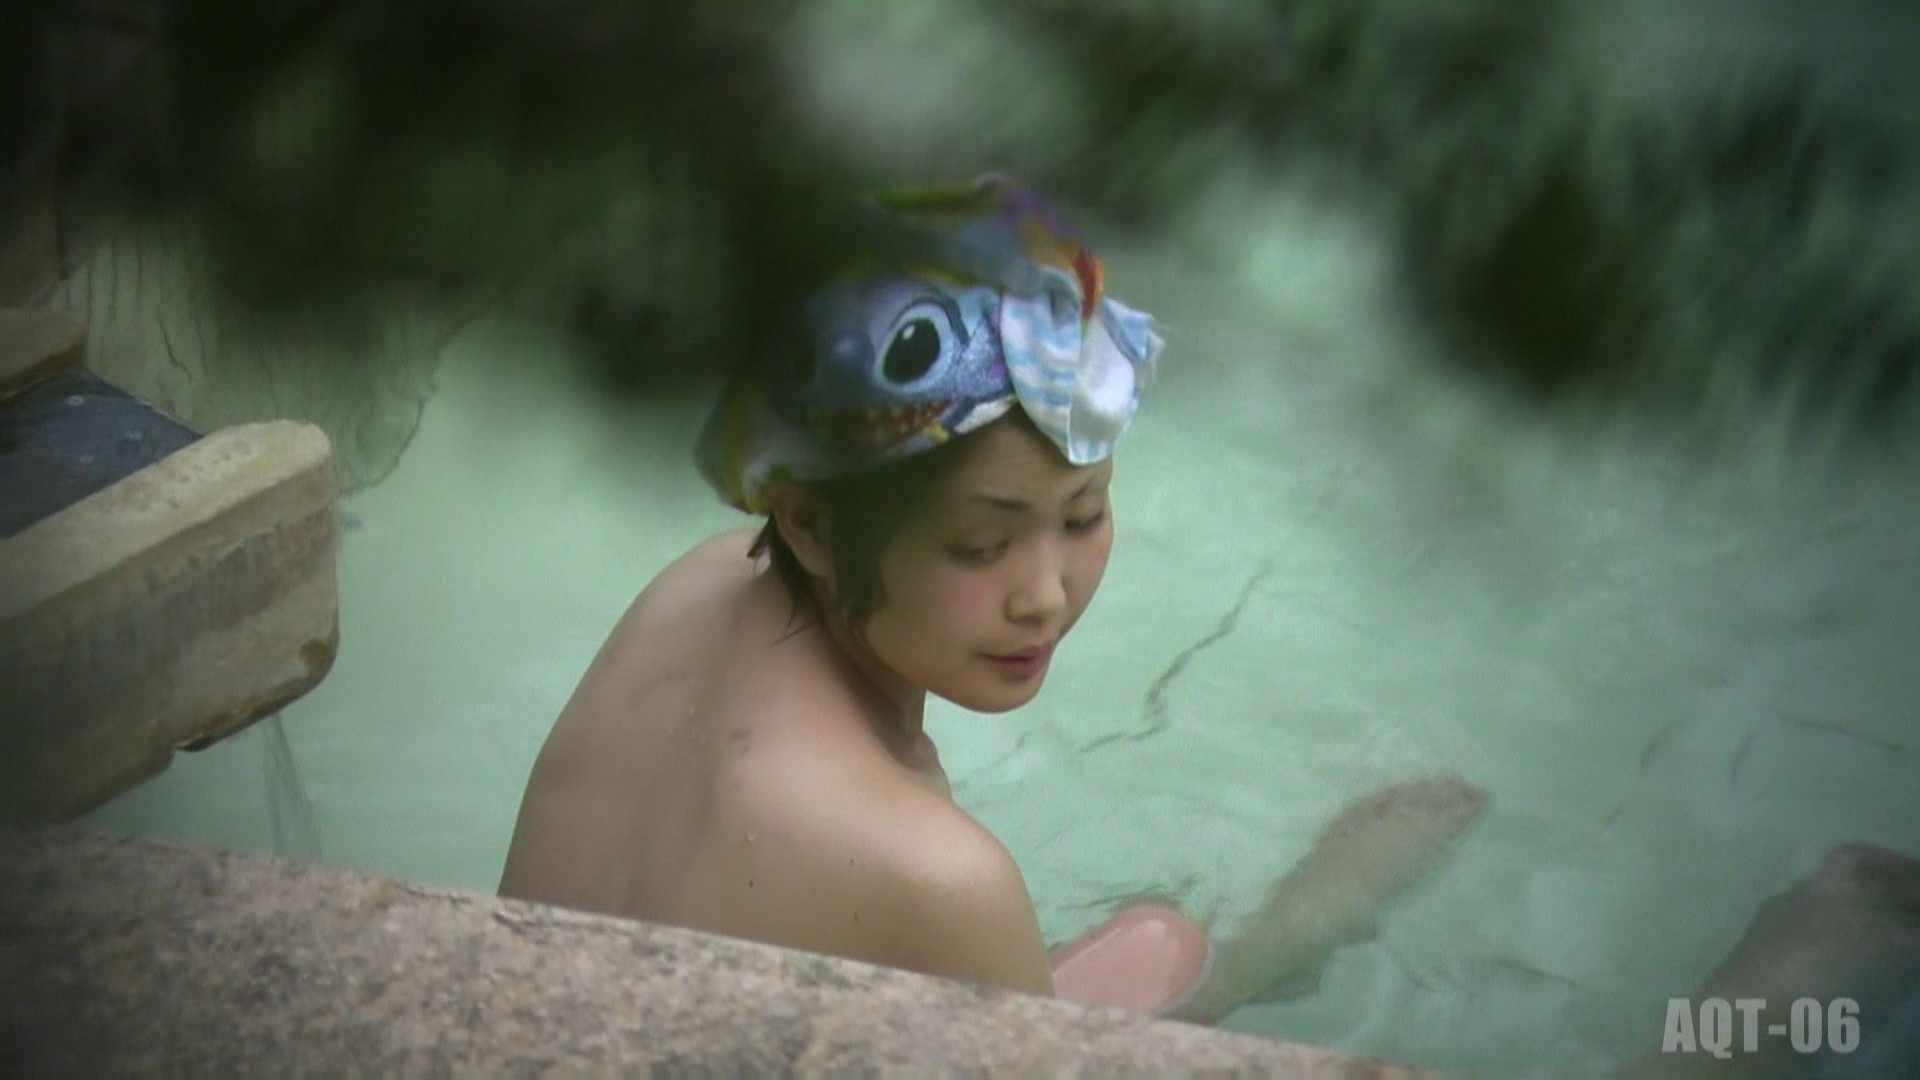 Aquaな露天風呂Vol.761 盗撮 エロ無料画像 74枚 32